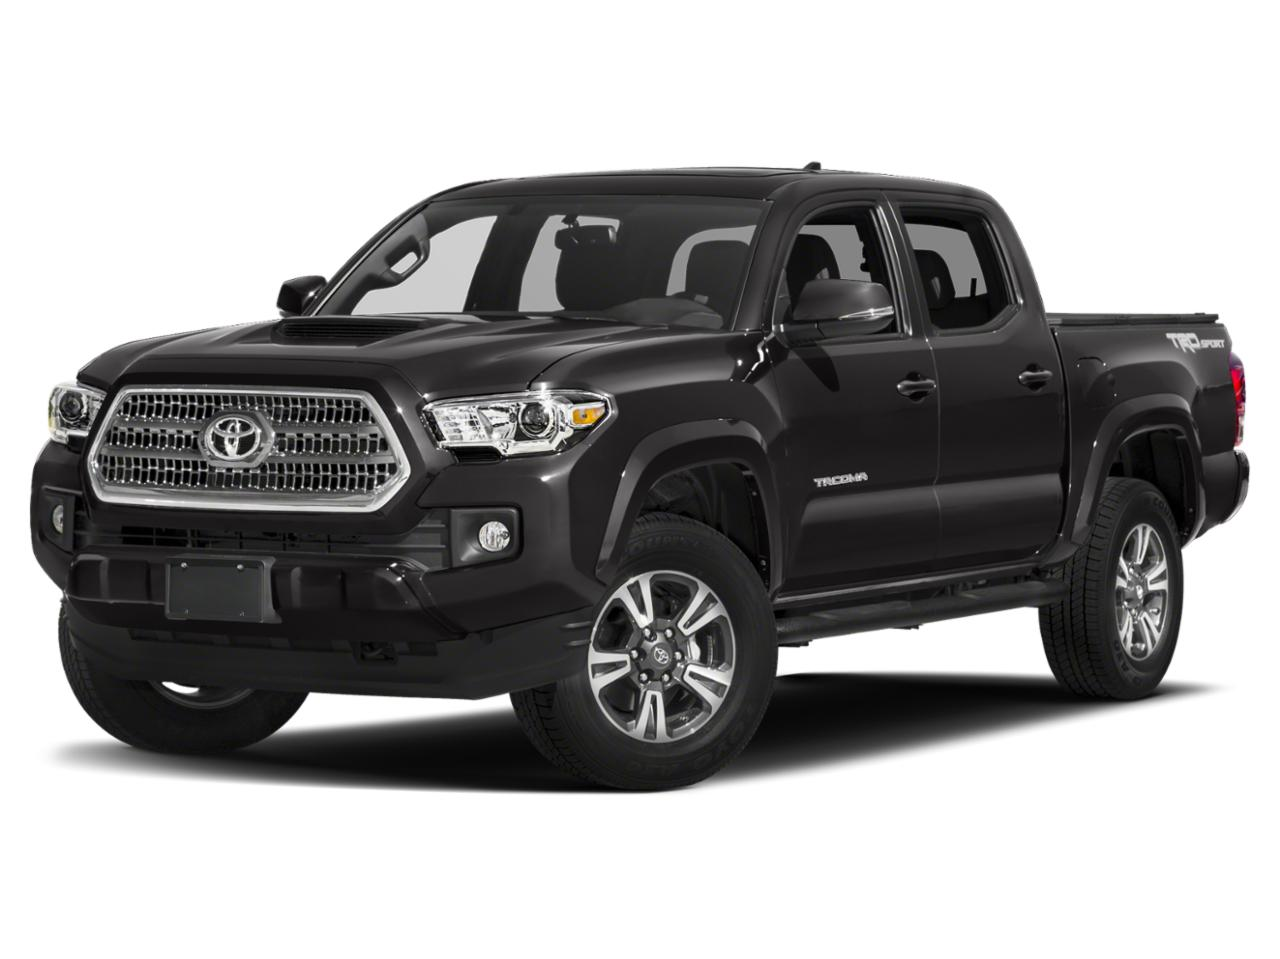 2018 Toyota Tacoma Vehicle Photo in Milton, FL 32570